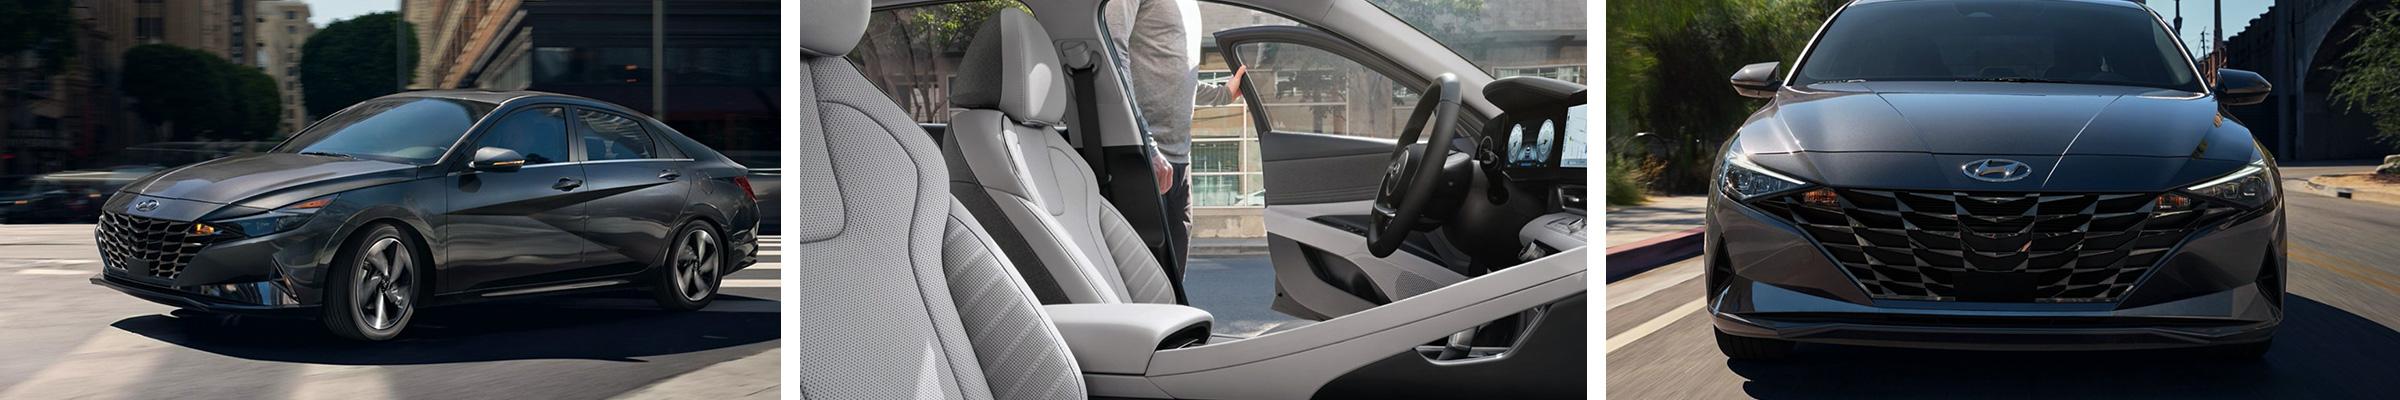 2021 Hyundai Elantra For Sale Dearborn MI | Detroit